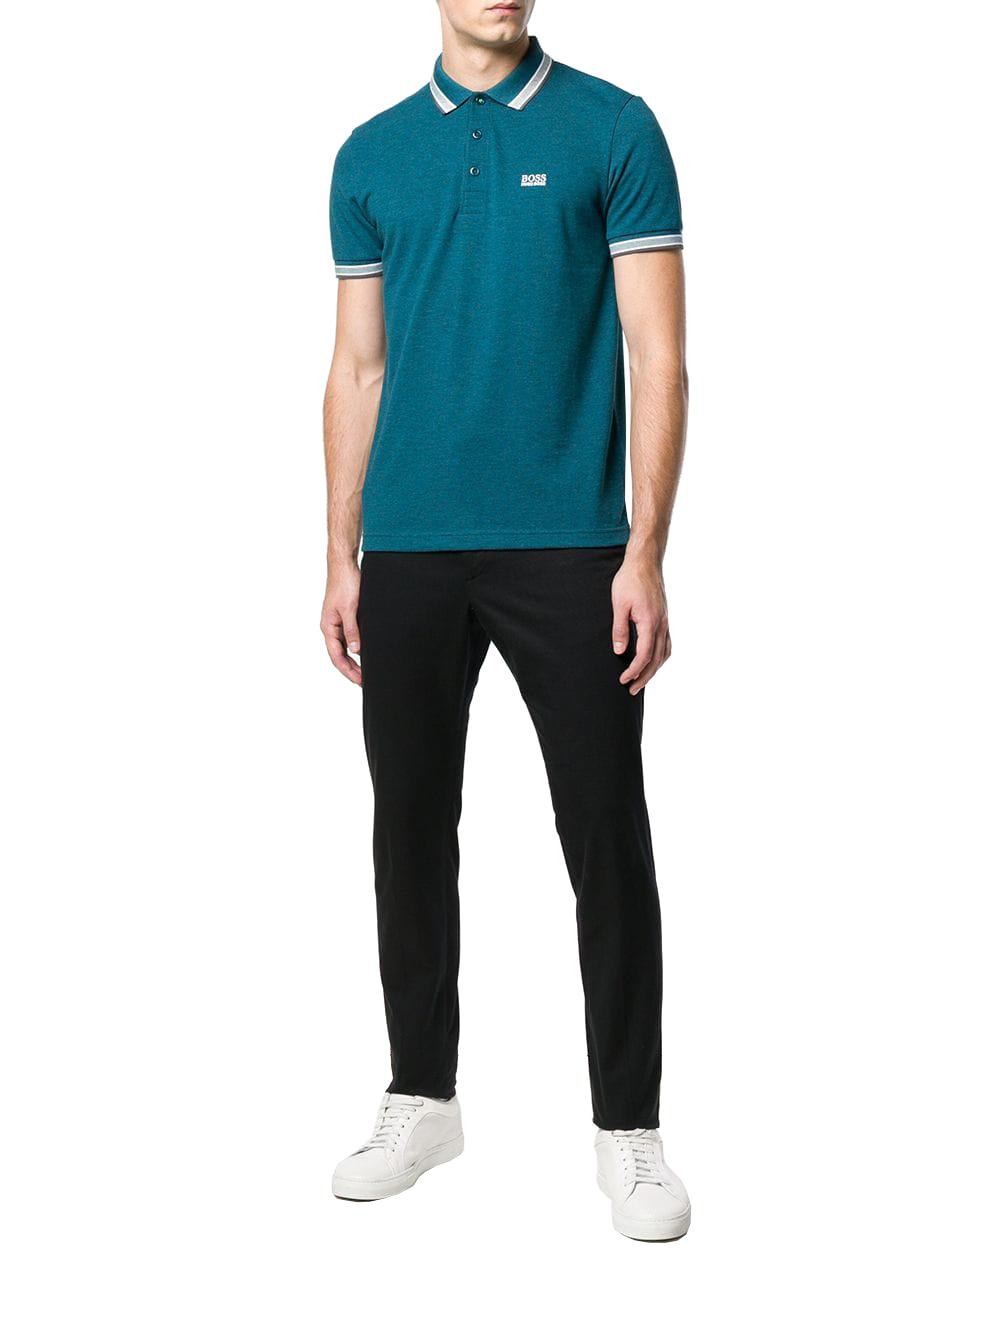 Hugo Boss Men's Premium Cotton Green Tag Sport Polo Shirt T-Shirt Paddy image 9